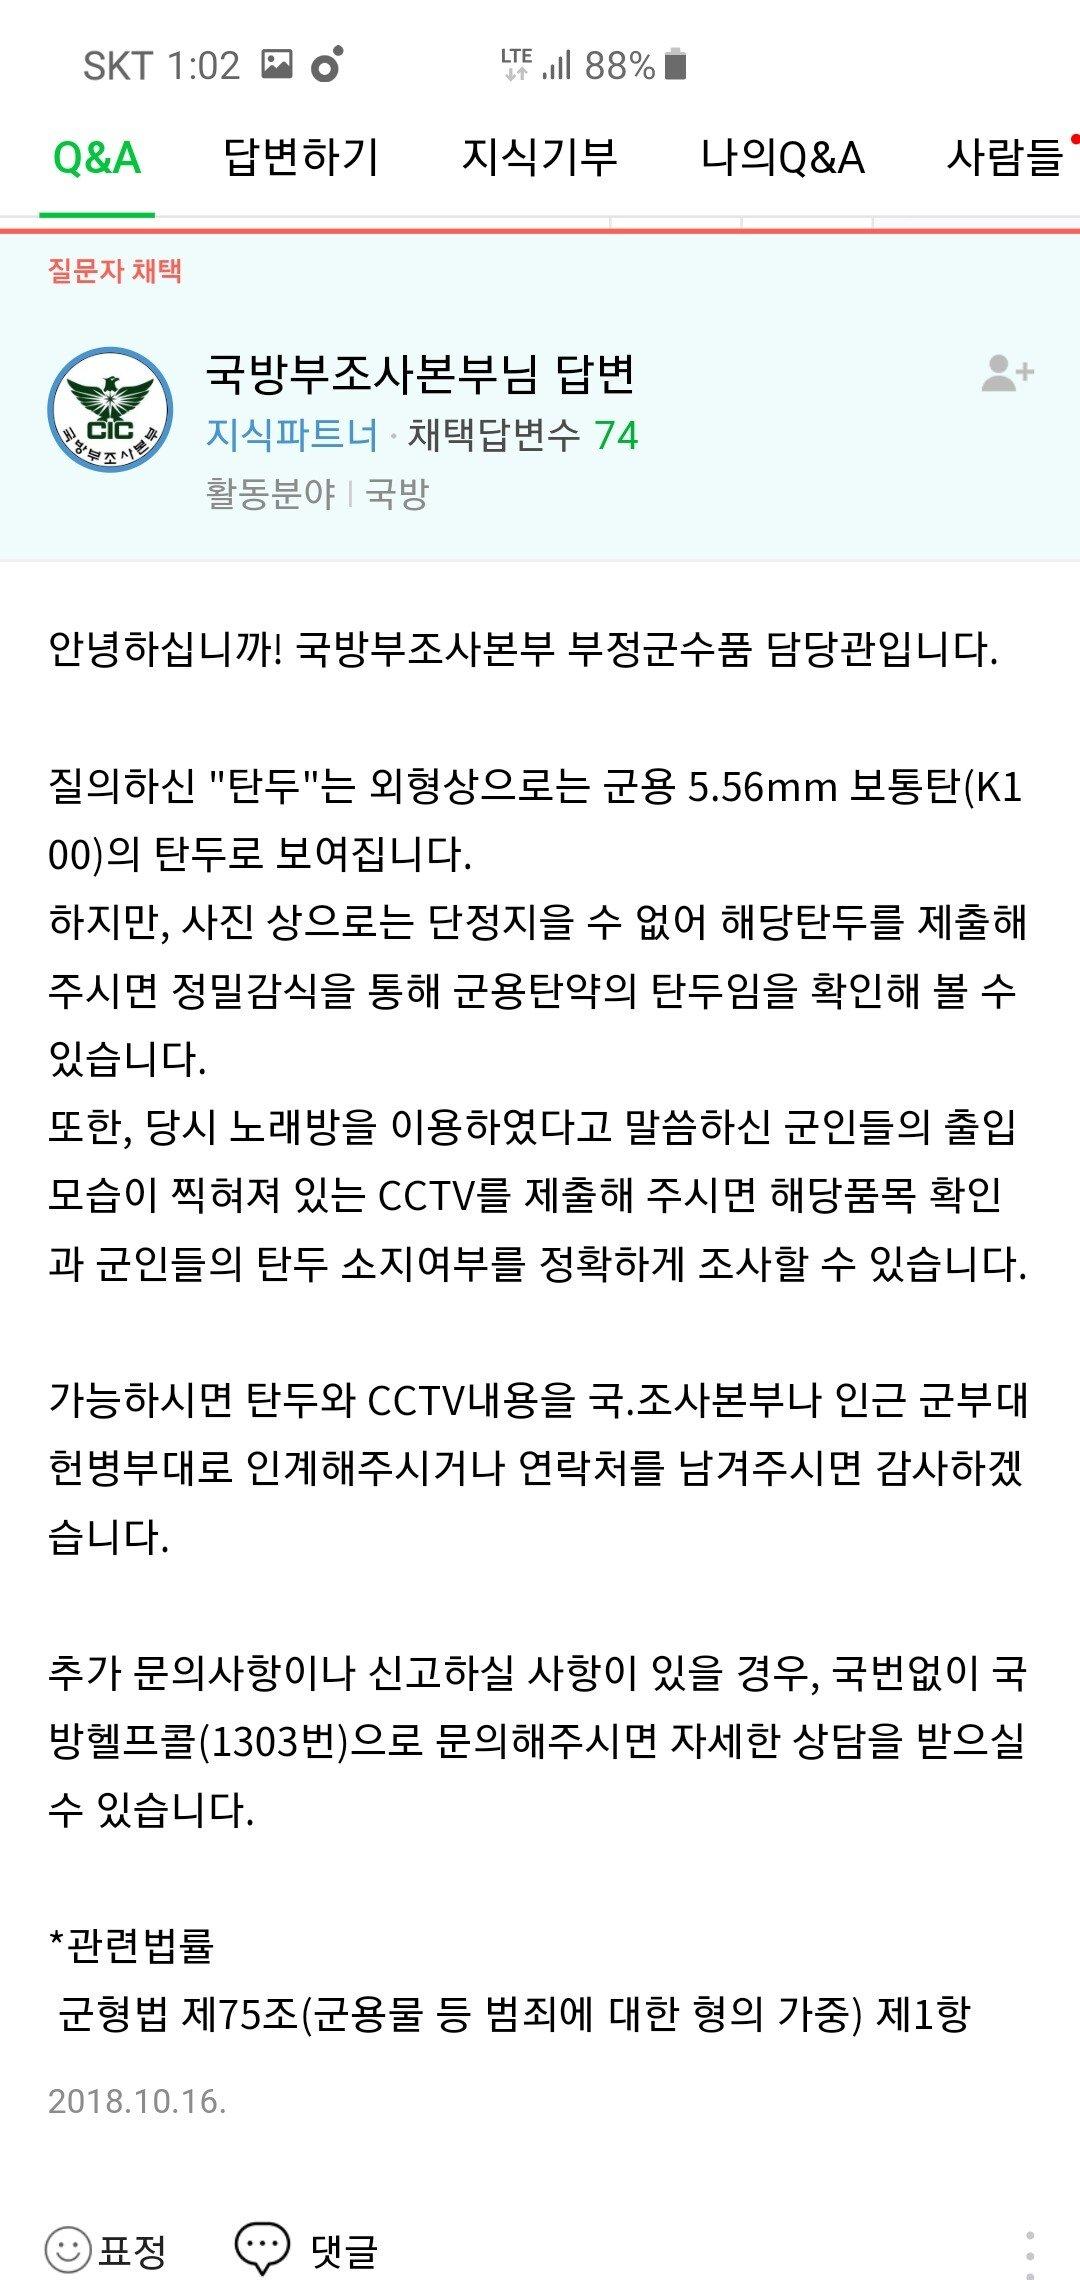 Screenshot_20190608-130208_Samsung Internet.jpg 코노에서 발견된 5.56mm 탄....jpg